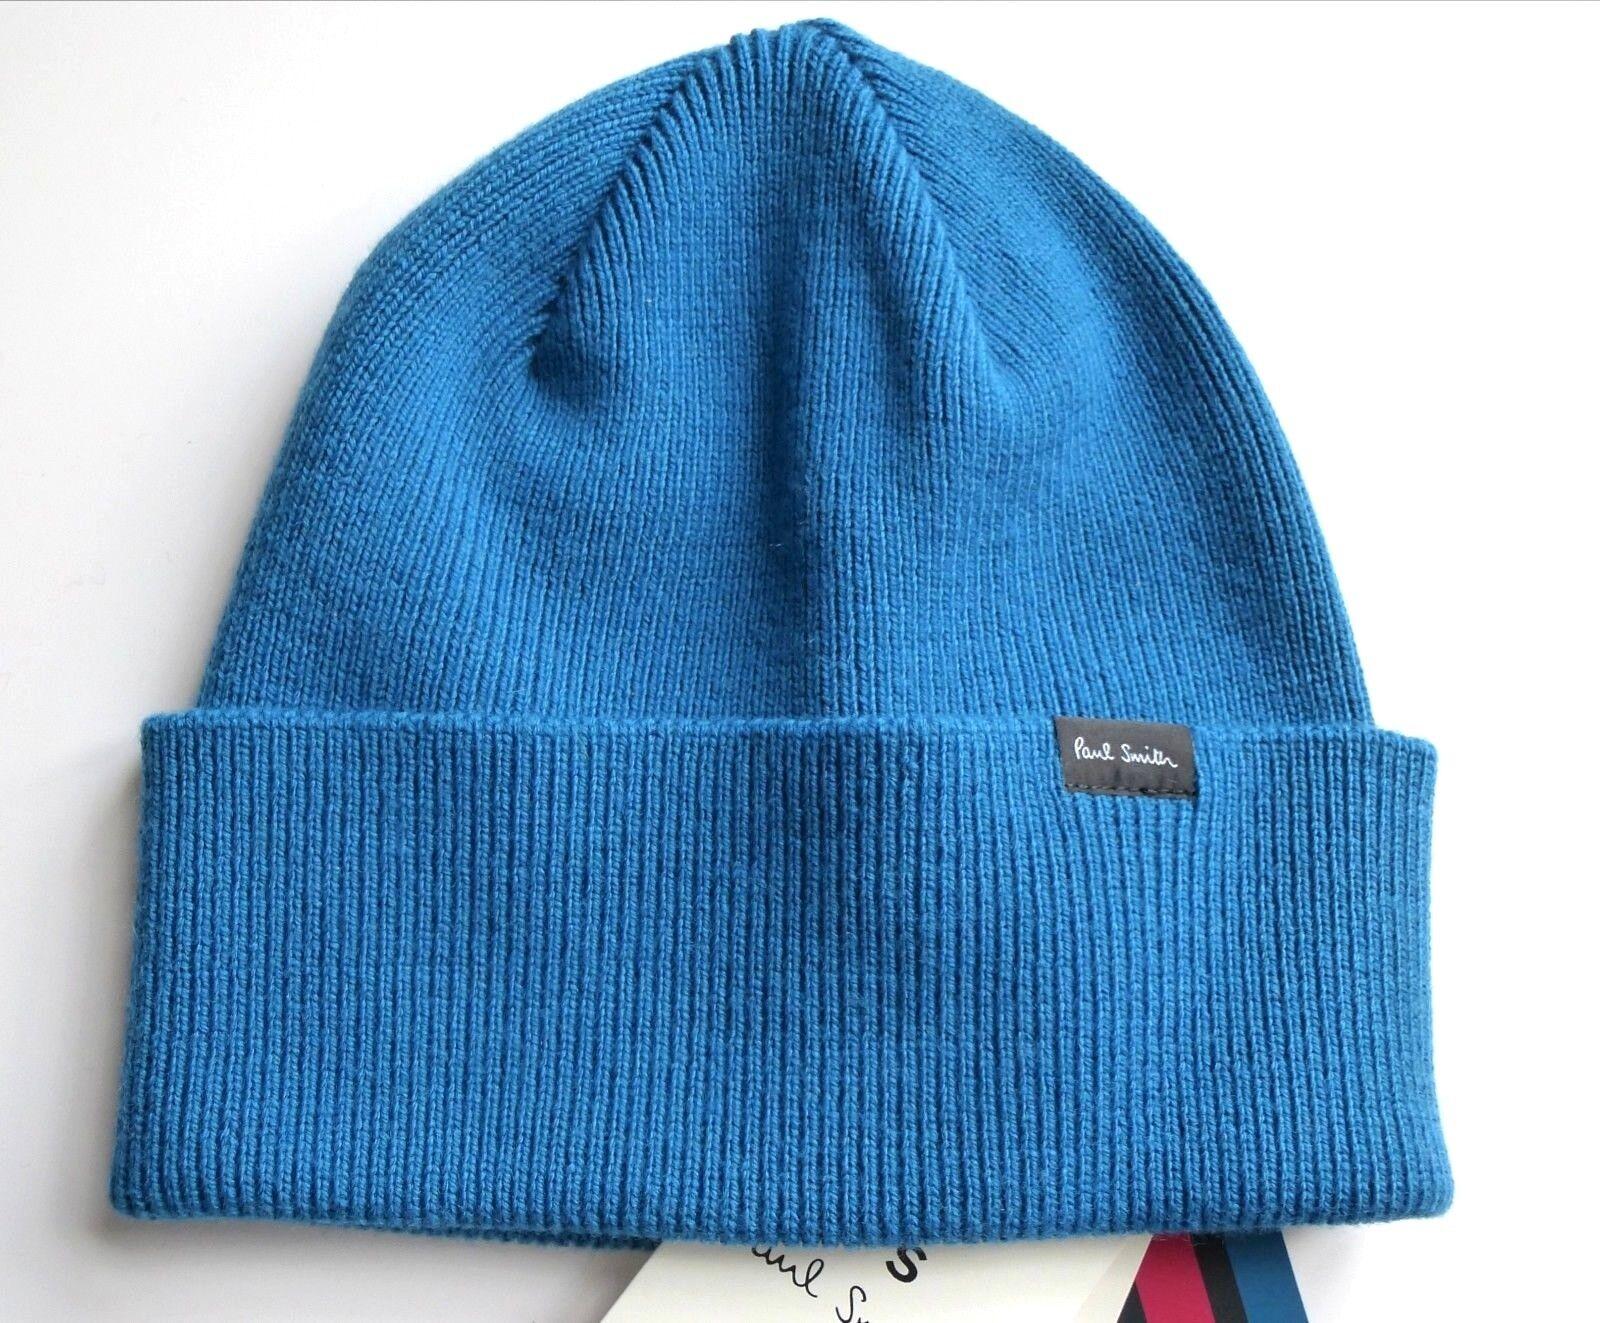 PAUL SMITH Petrol bluee 100% Merino Wool Beanie Hat Toque MADE IN SCOTLAND Tags